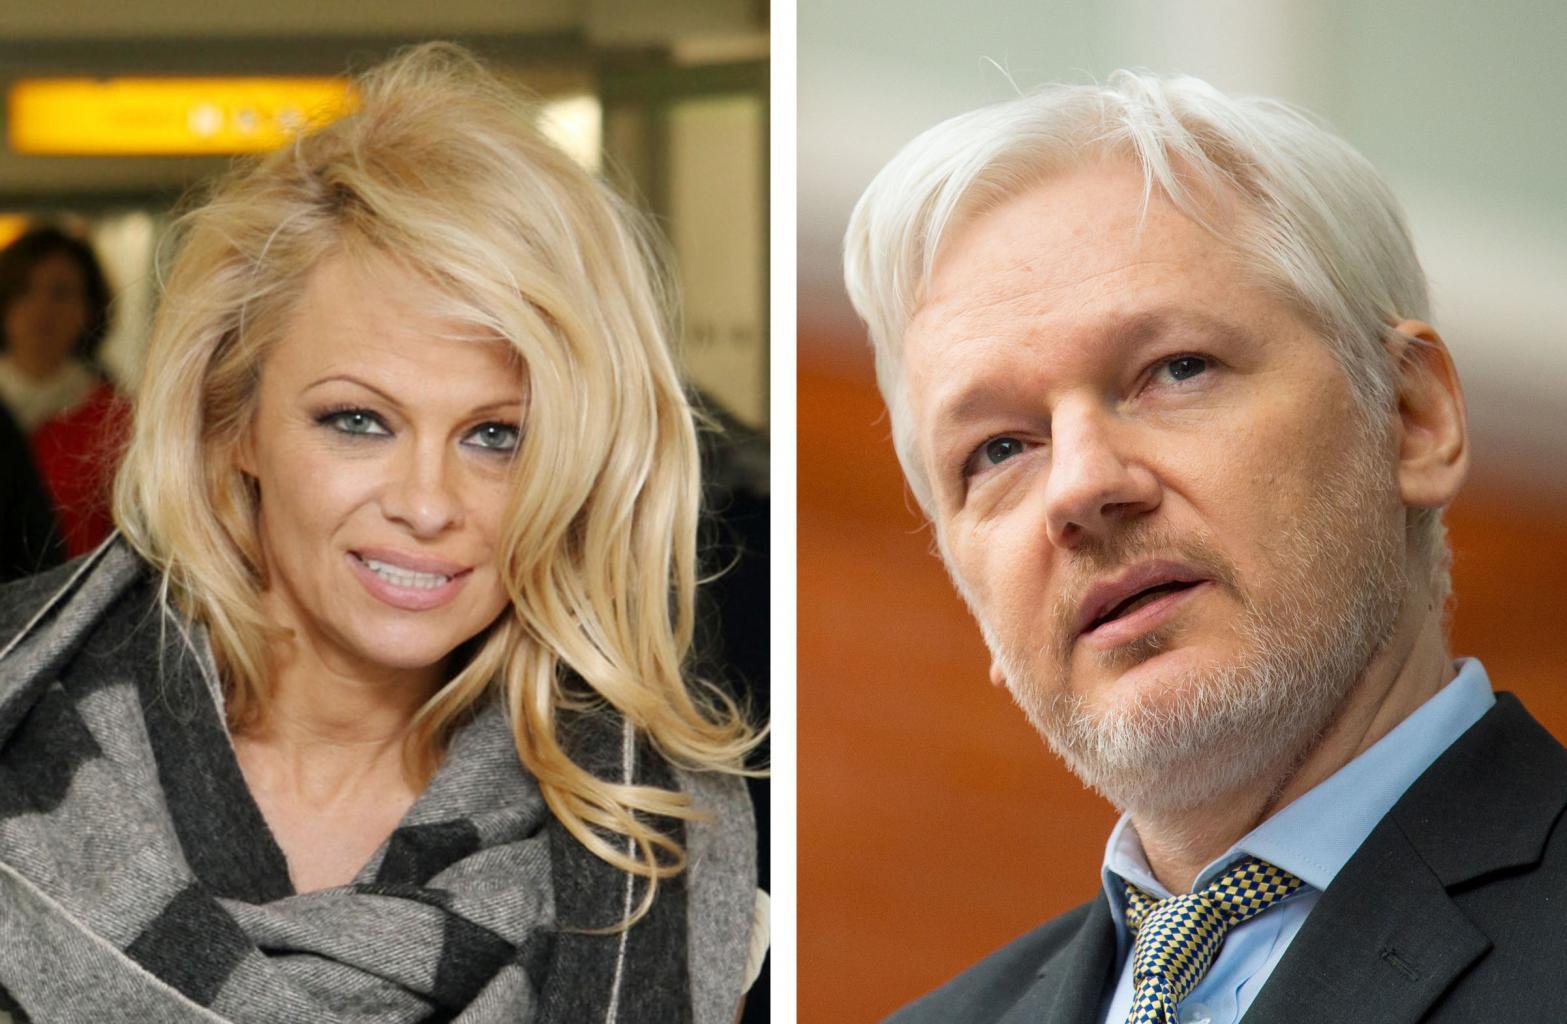 Pamela Anderson Visits WikiLeaks '  Julian Assange, Brings Him   'A Nice Vegan Lunch